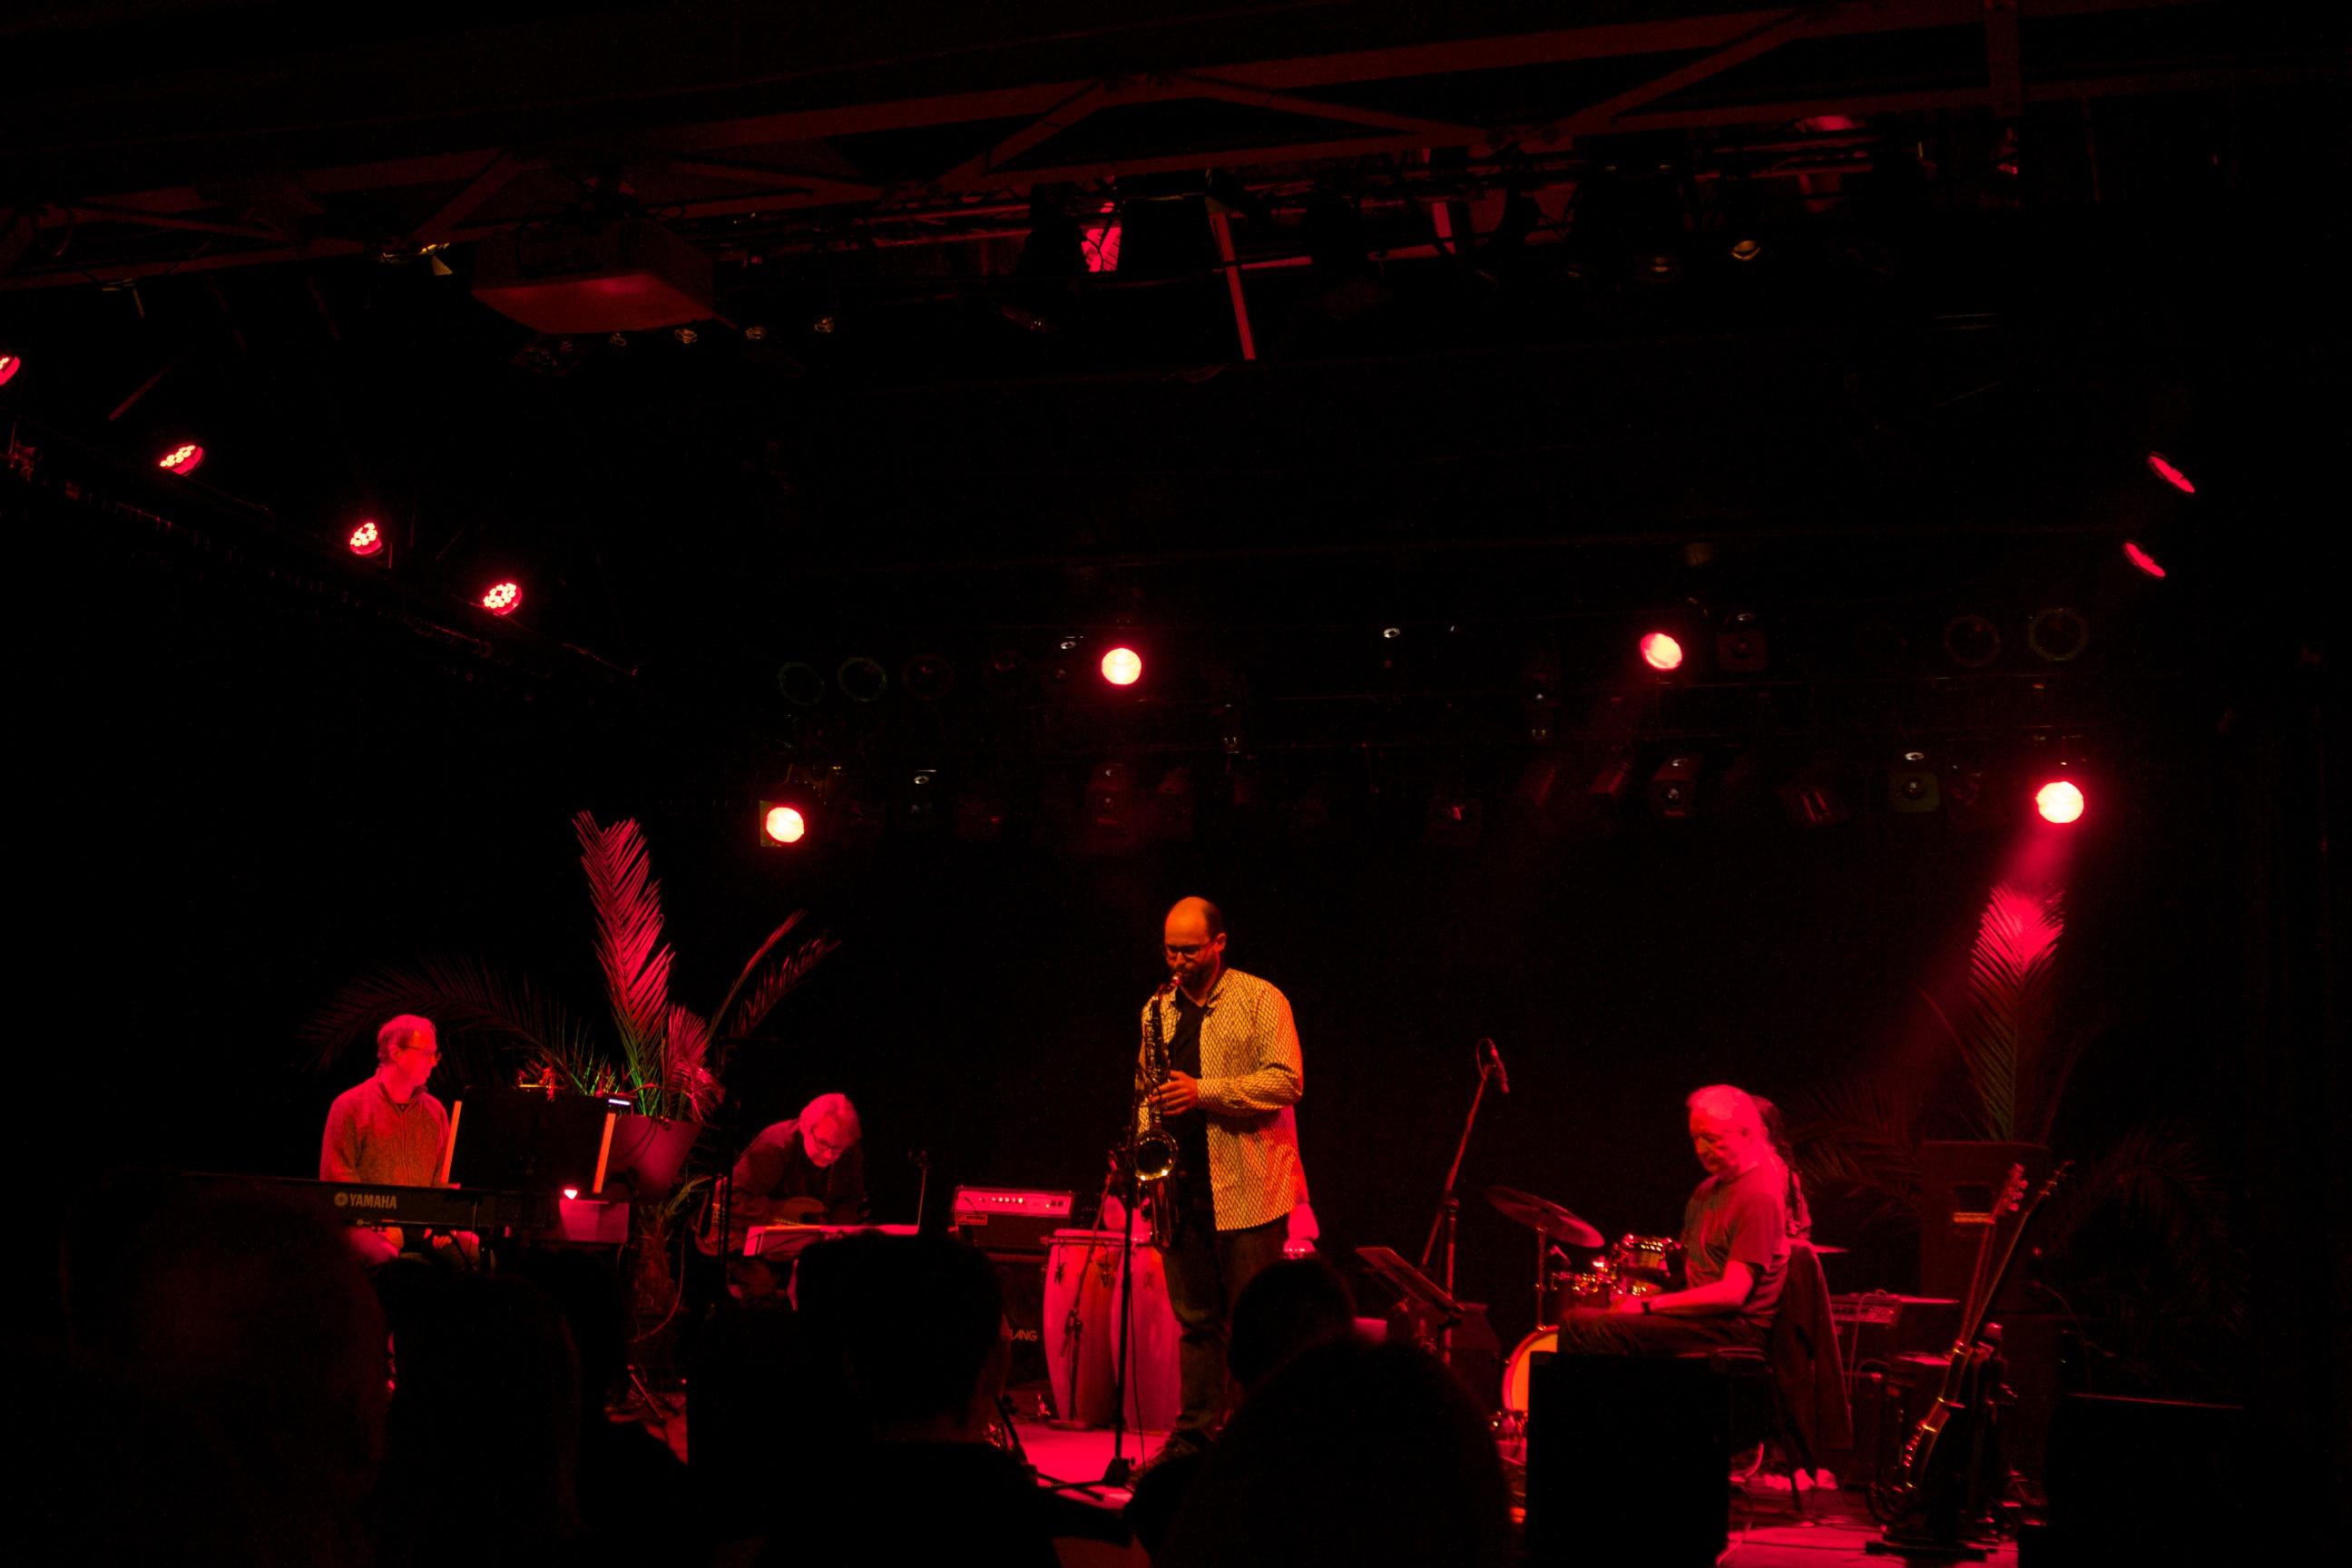 18-01-27-Konzert-Eurovoodoo-Becker-und-Funck-DN-36